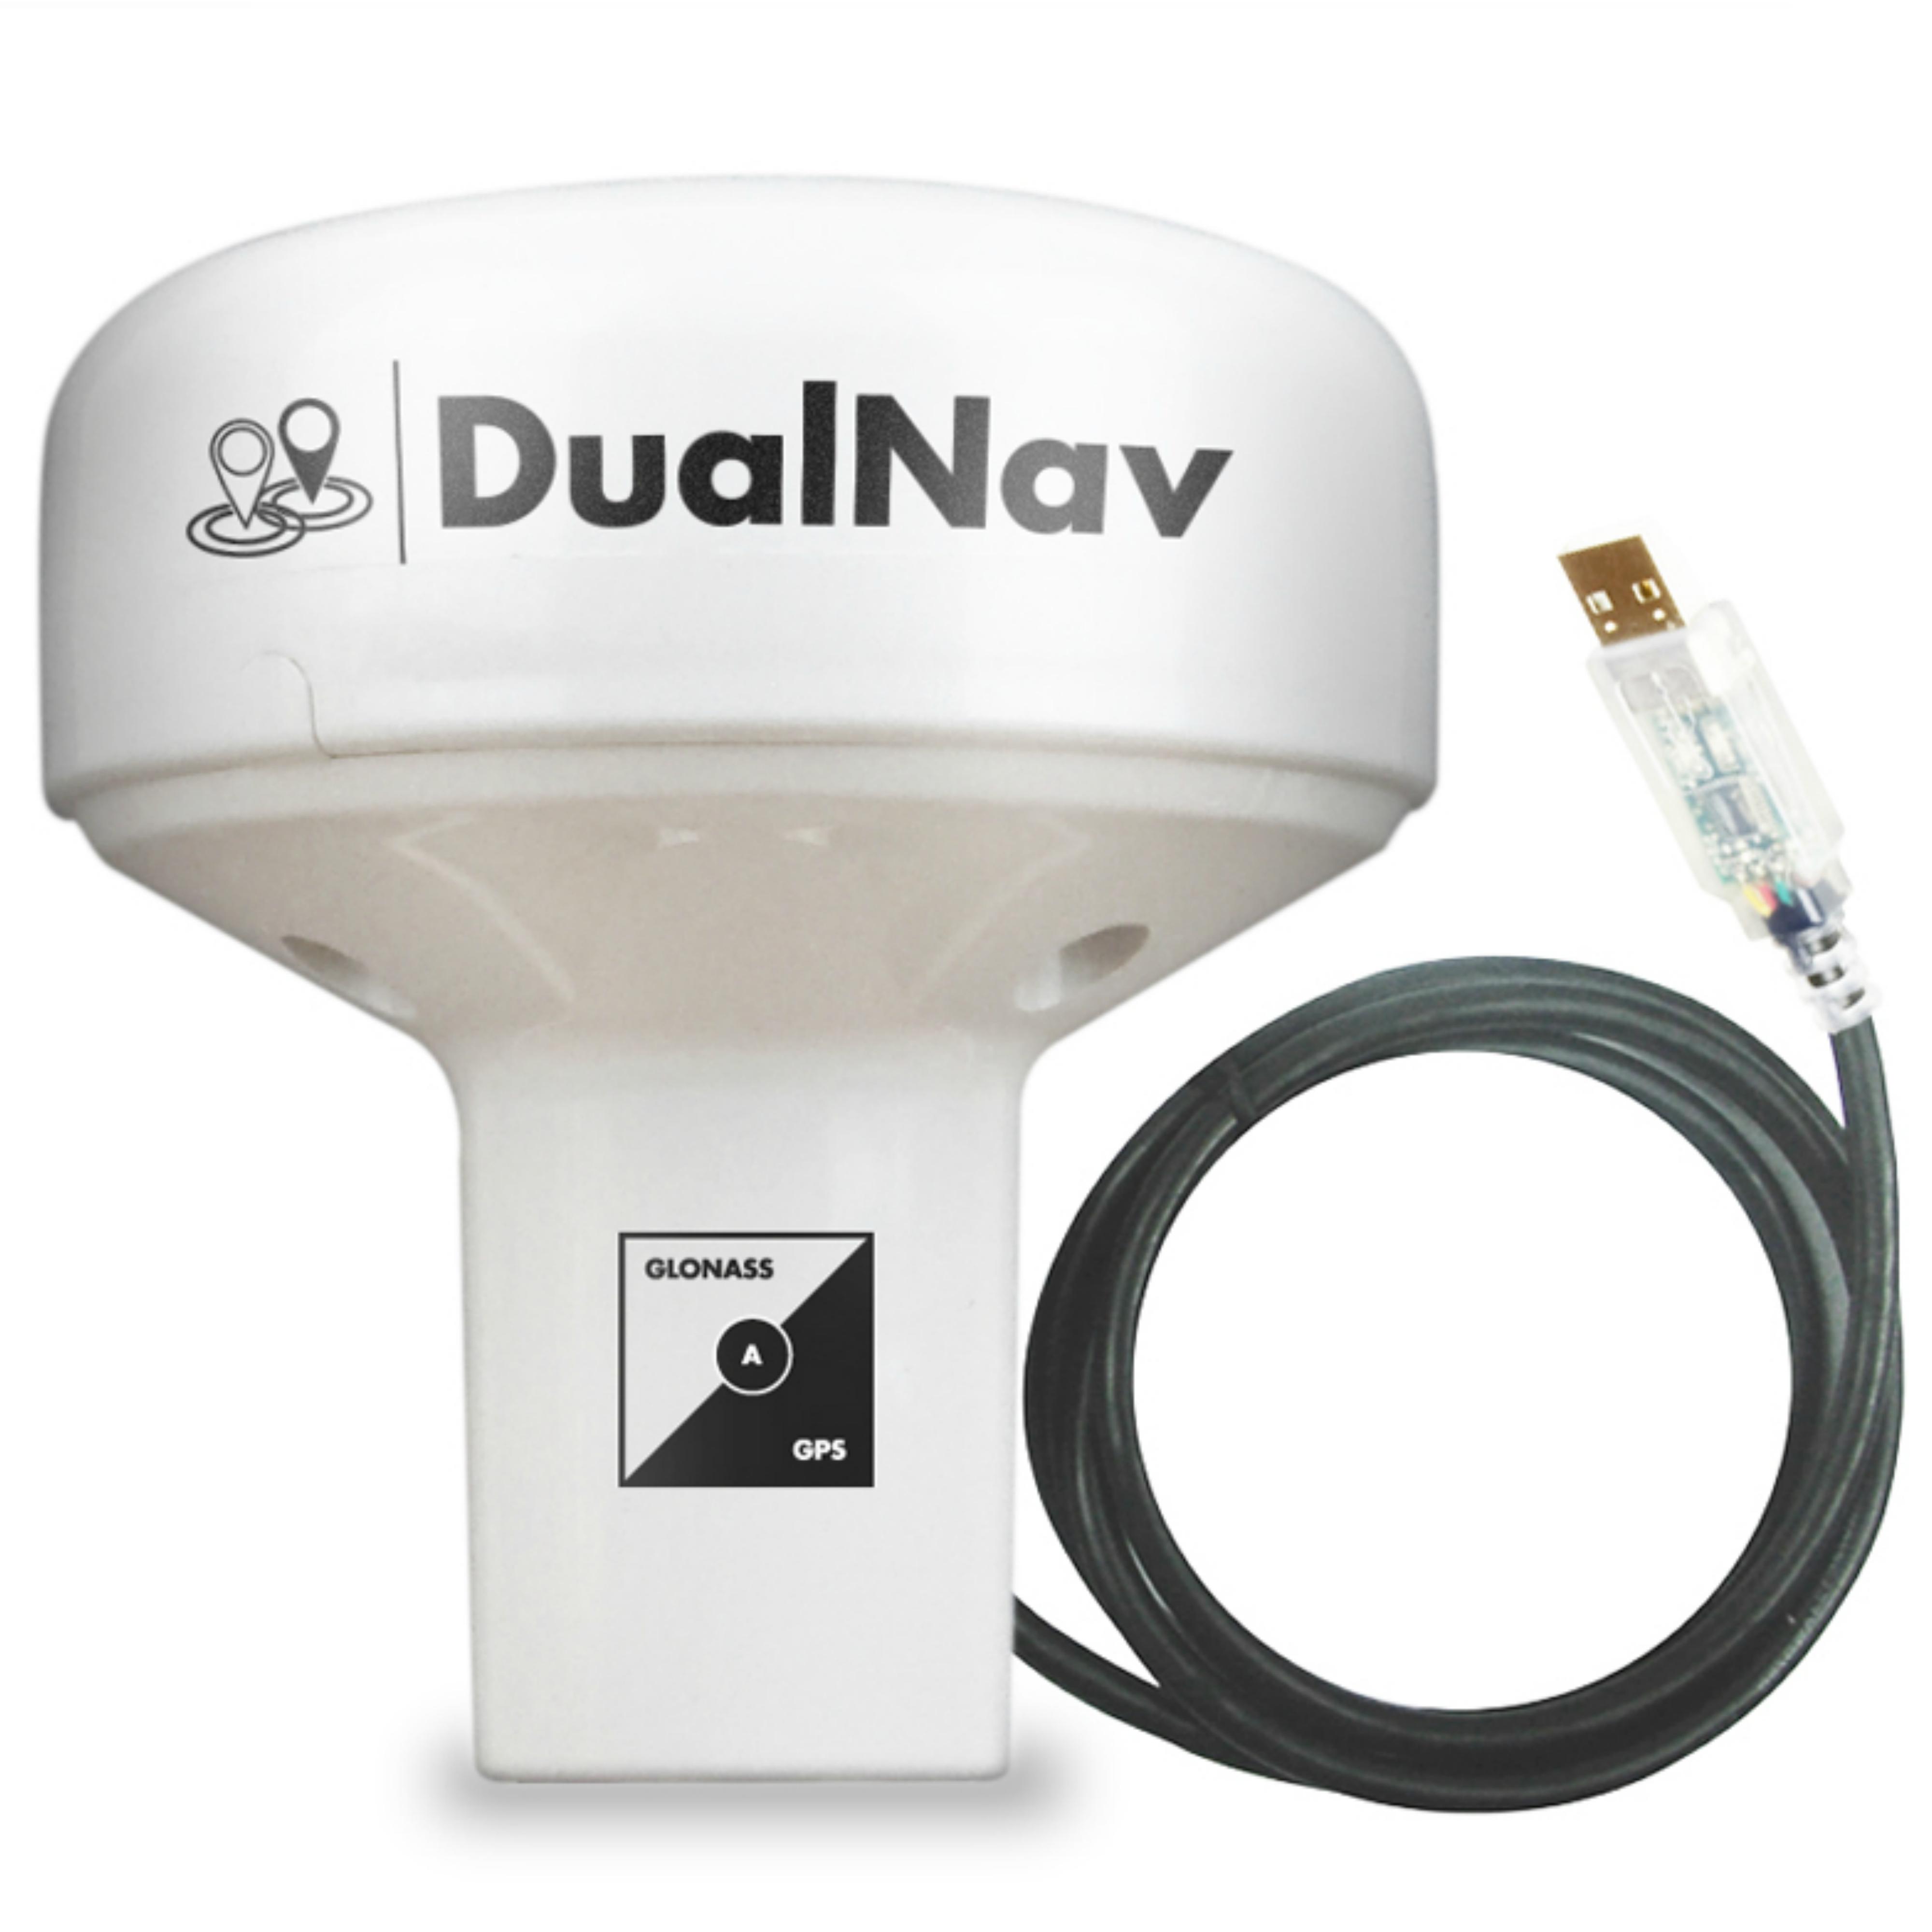 Digital Yacht-GPS150USB|DUALNAV GPS/GLONASS Sensor|Self-Powered via 5m USB cable